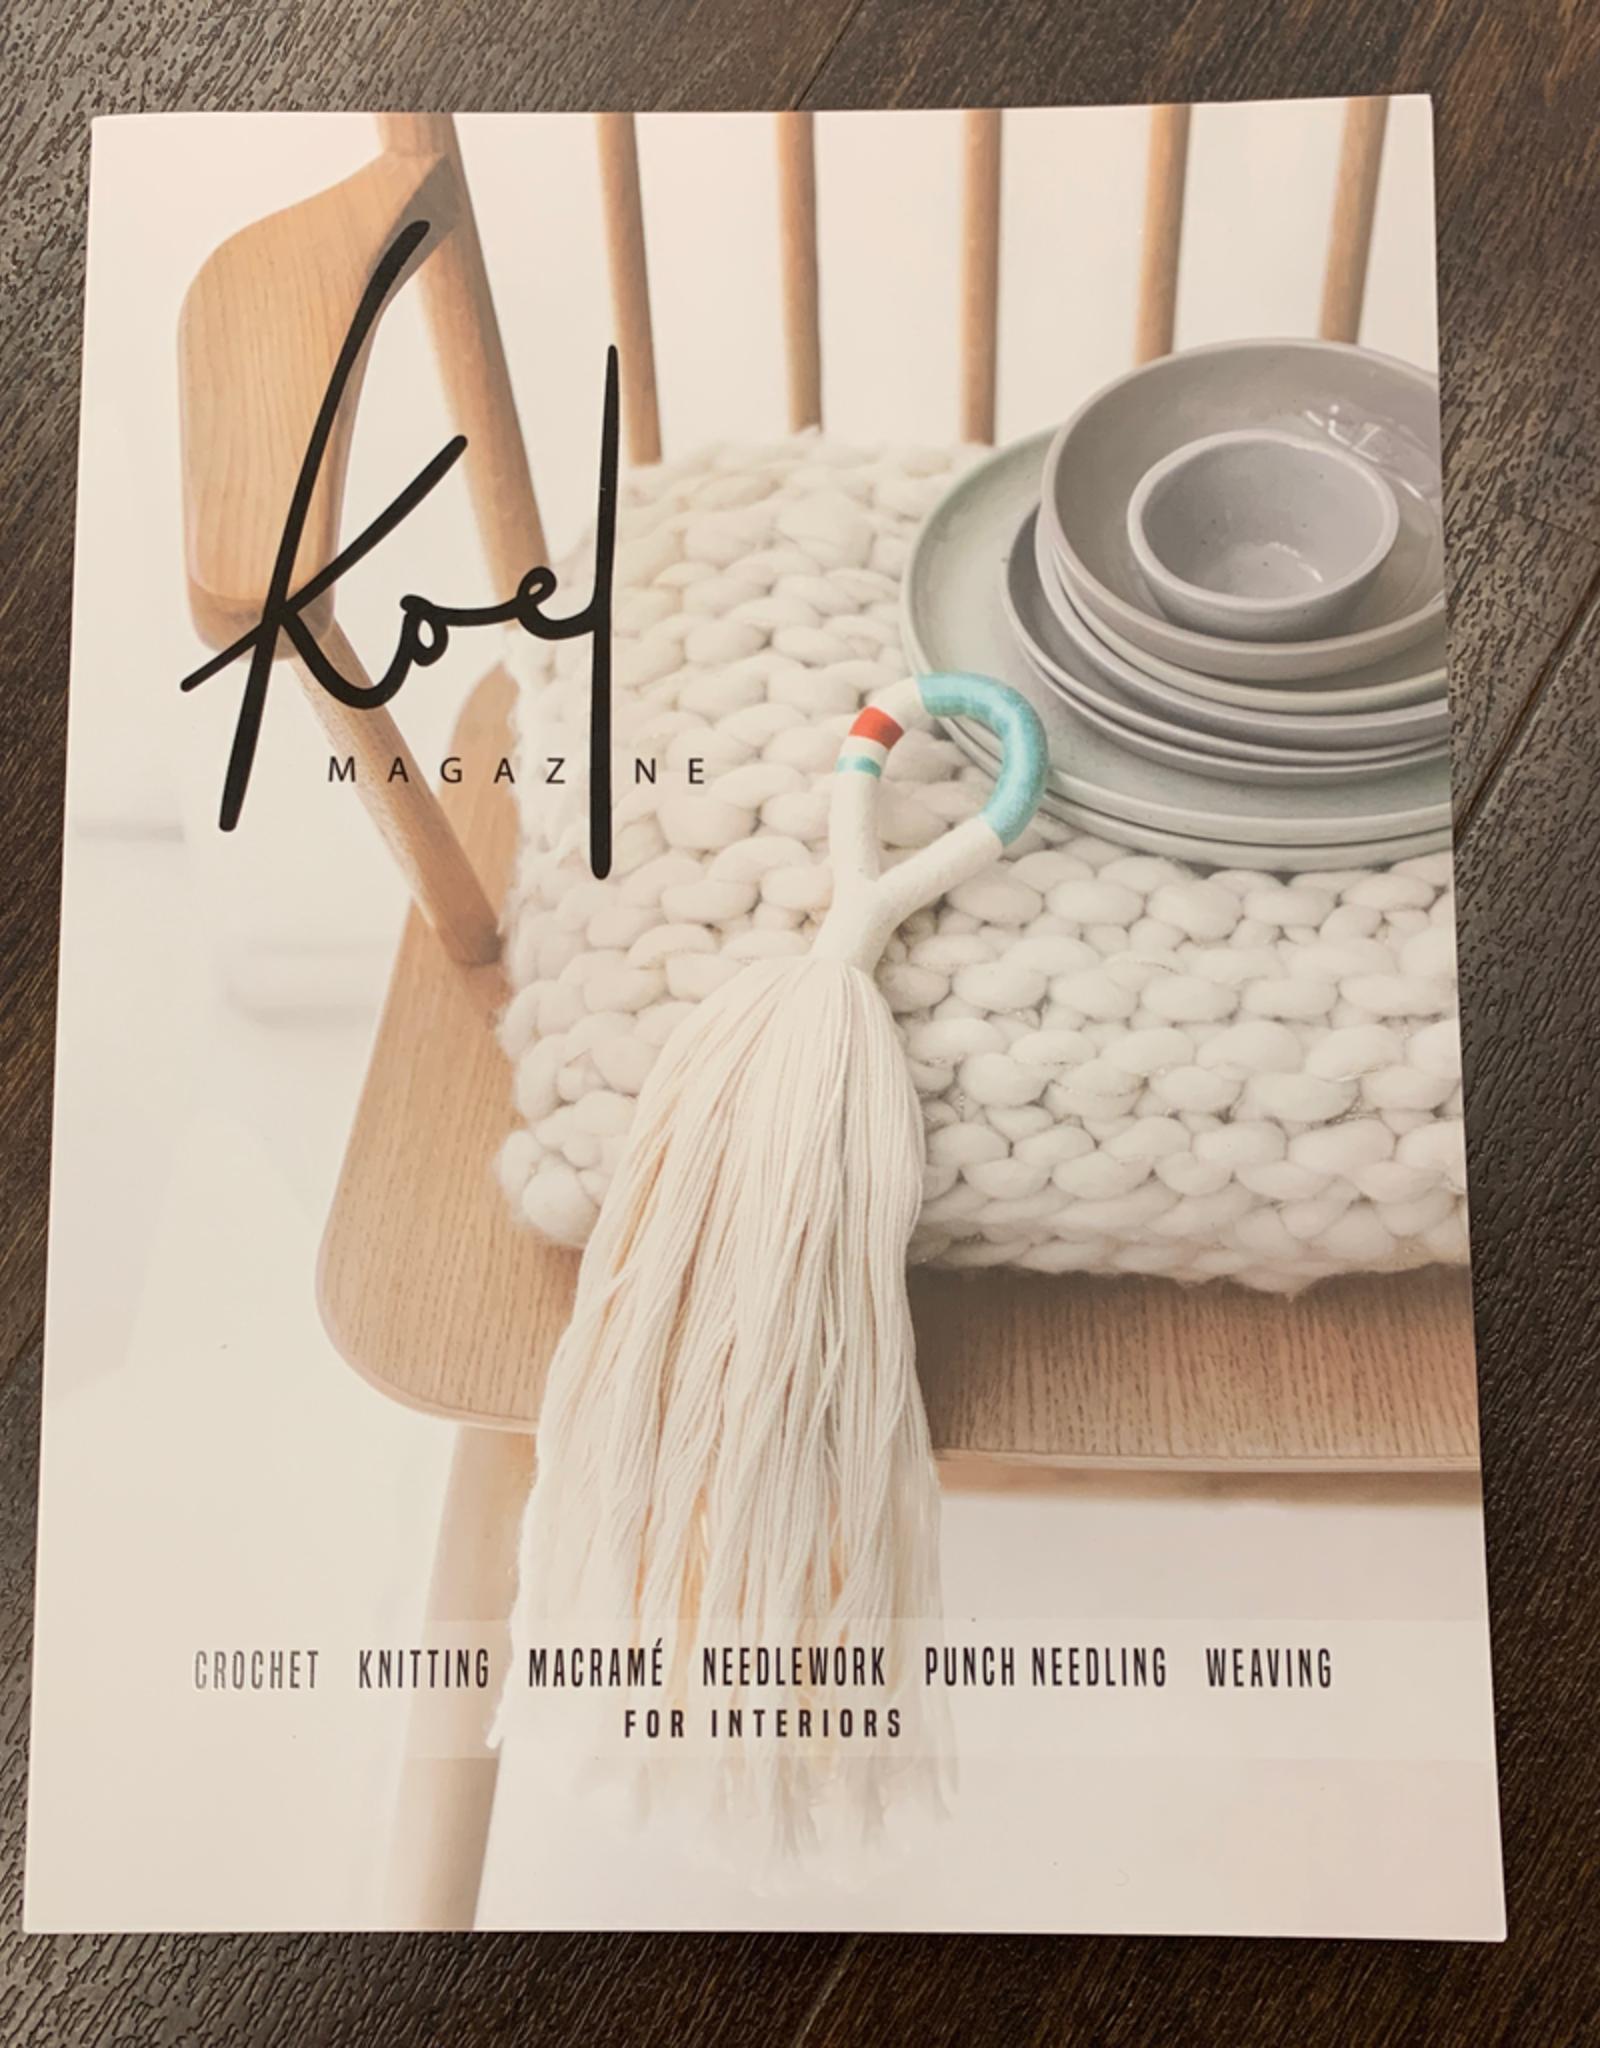 Koel Koel Magazine - Issue 6 Qtr 3 2018